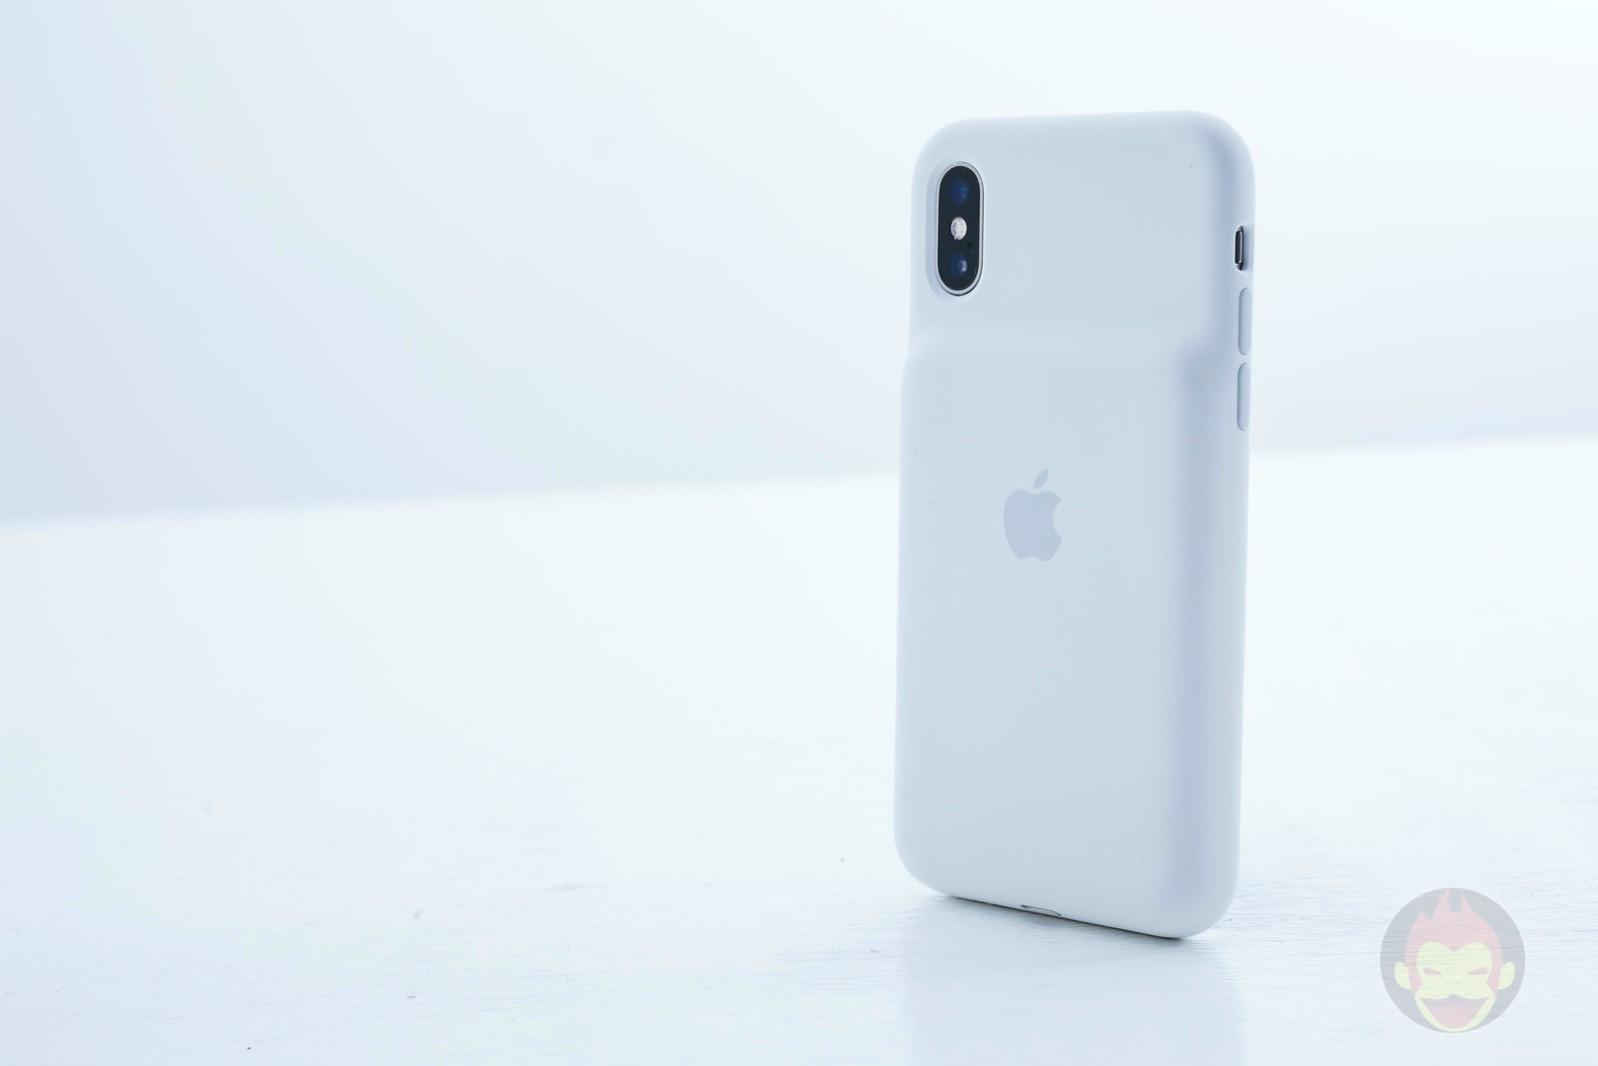 Smart-Battery-Case-for-iPhoneXS-Review-11.jpg